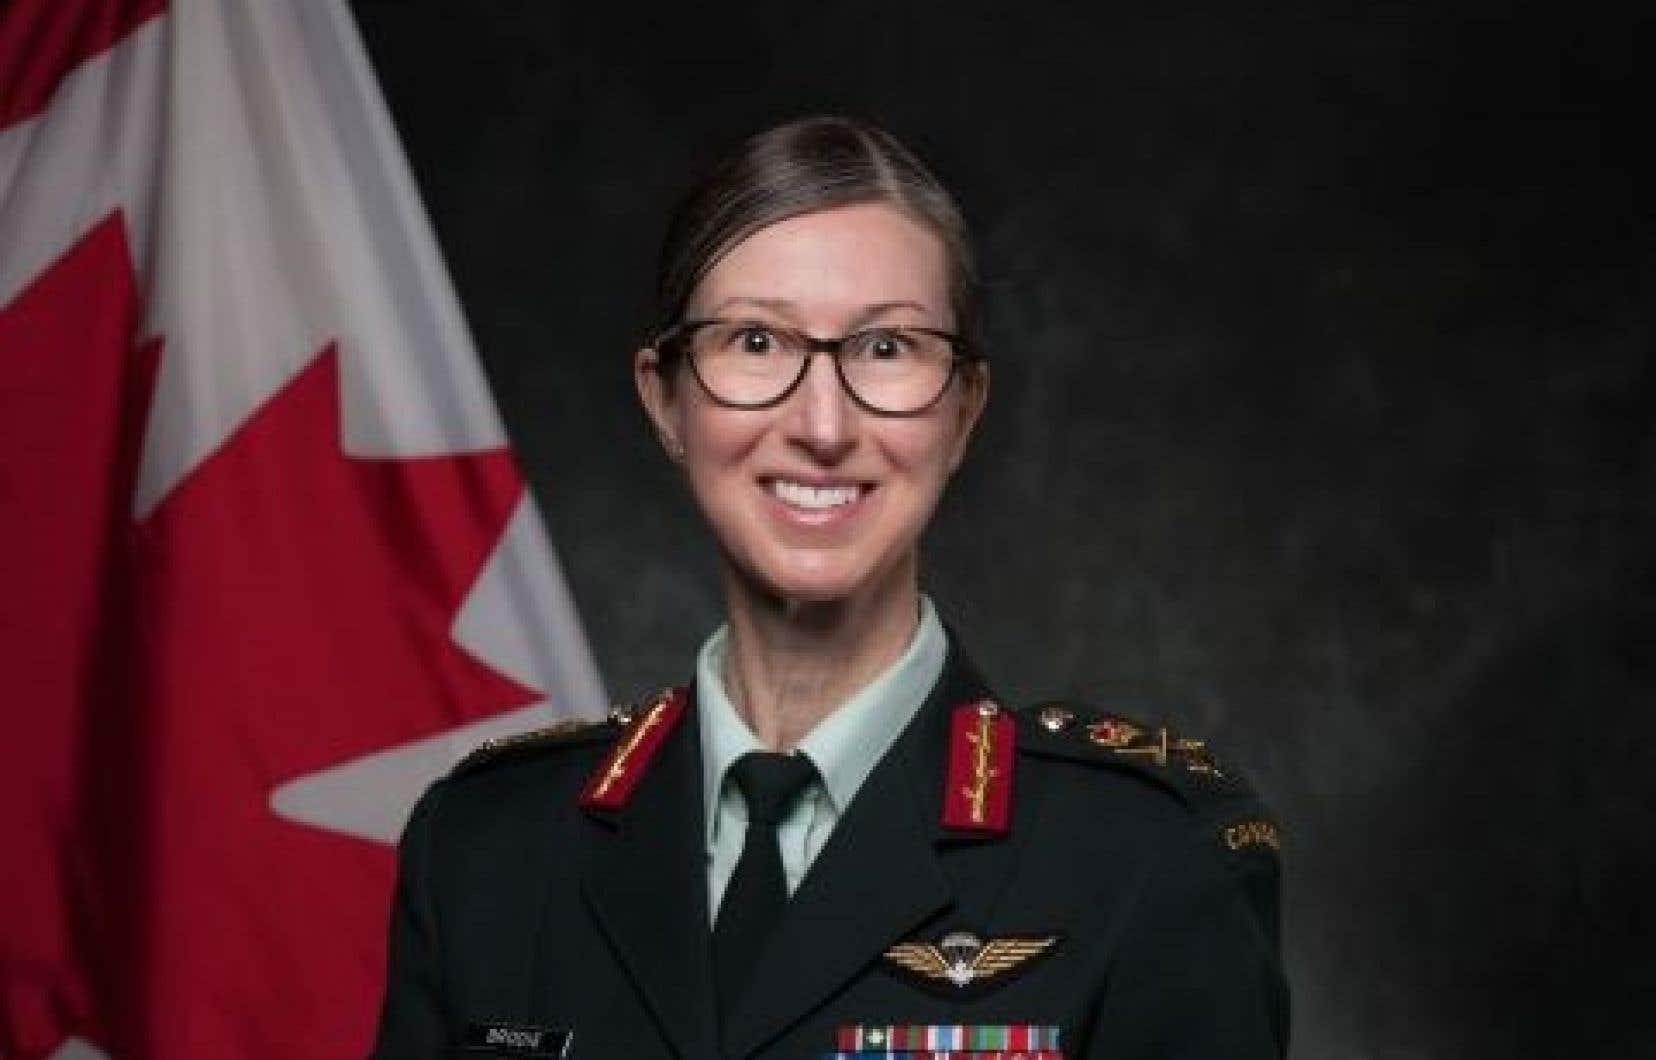 La brigadier général Krista Brodie